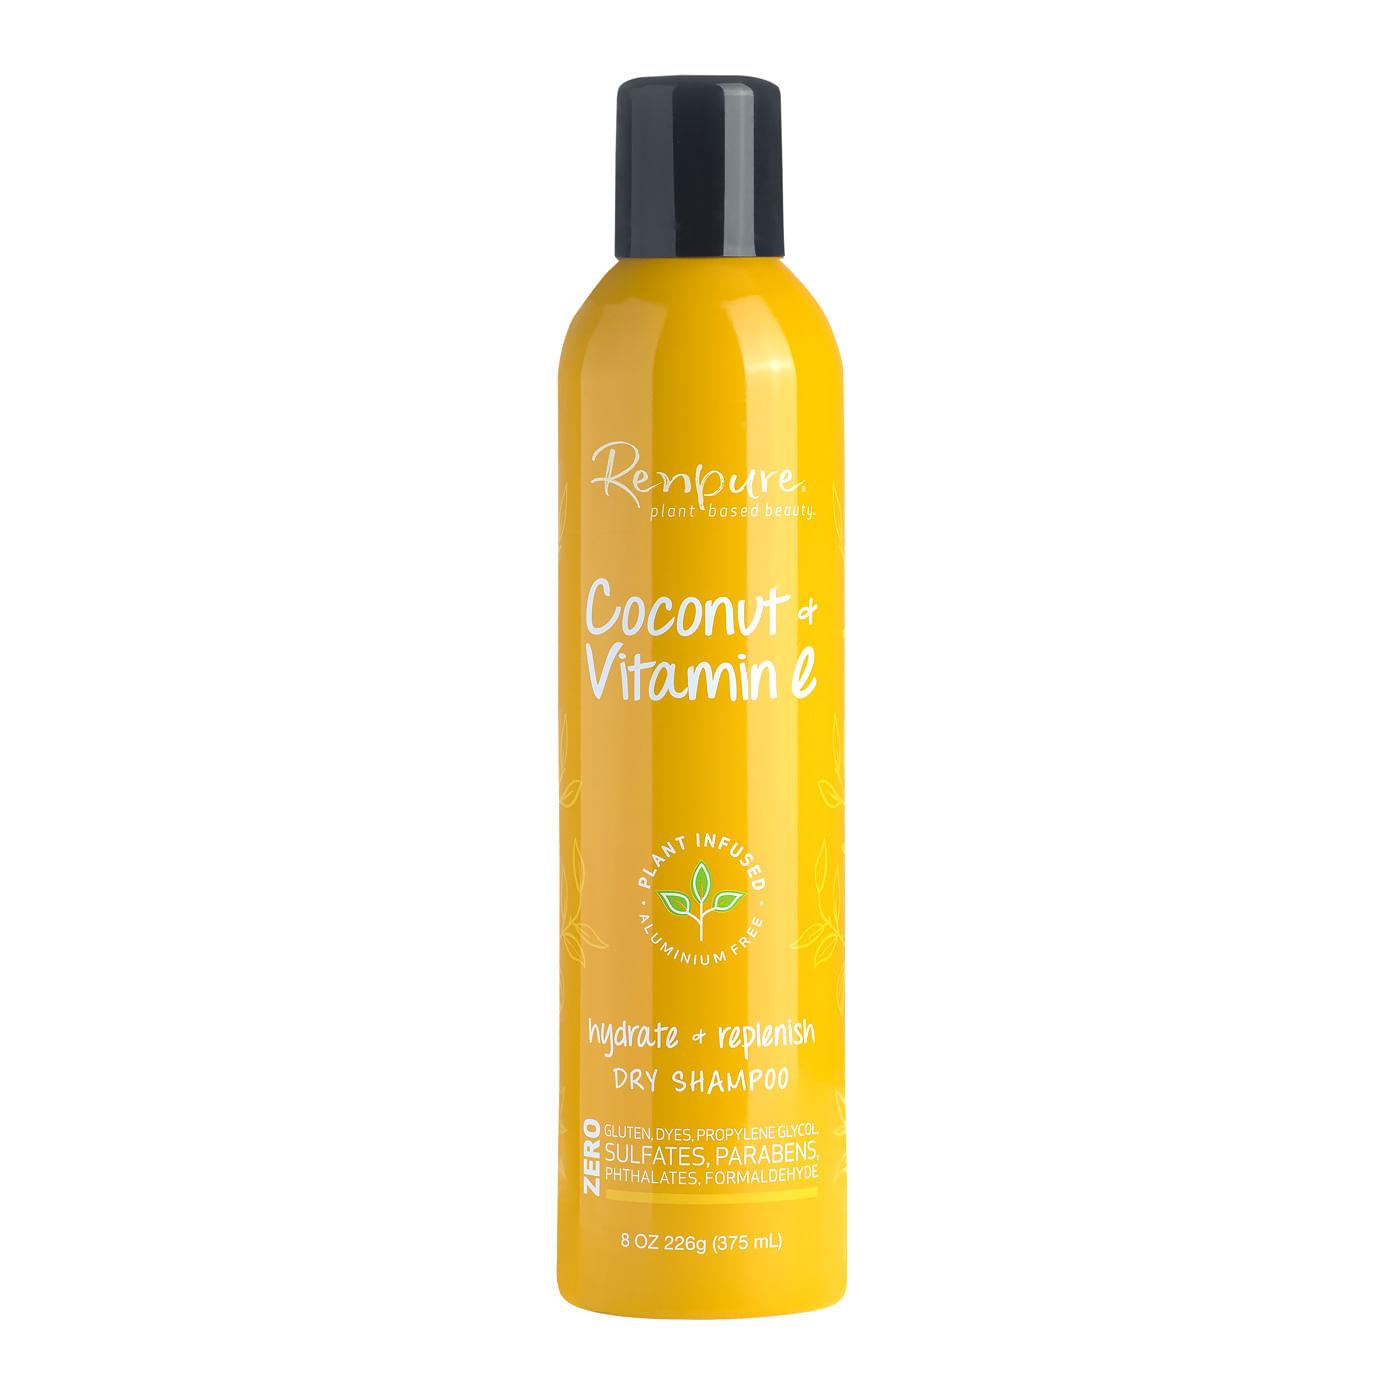 Shampoo Renpure Coconut Vitamin e dry 8oz